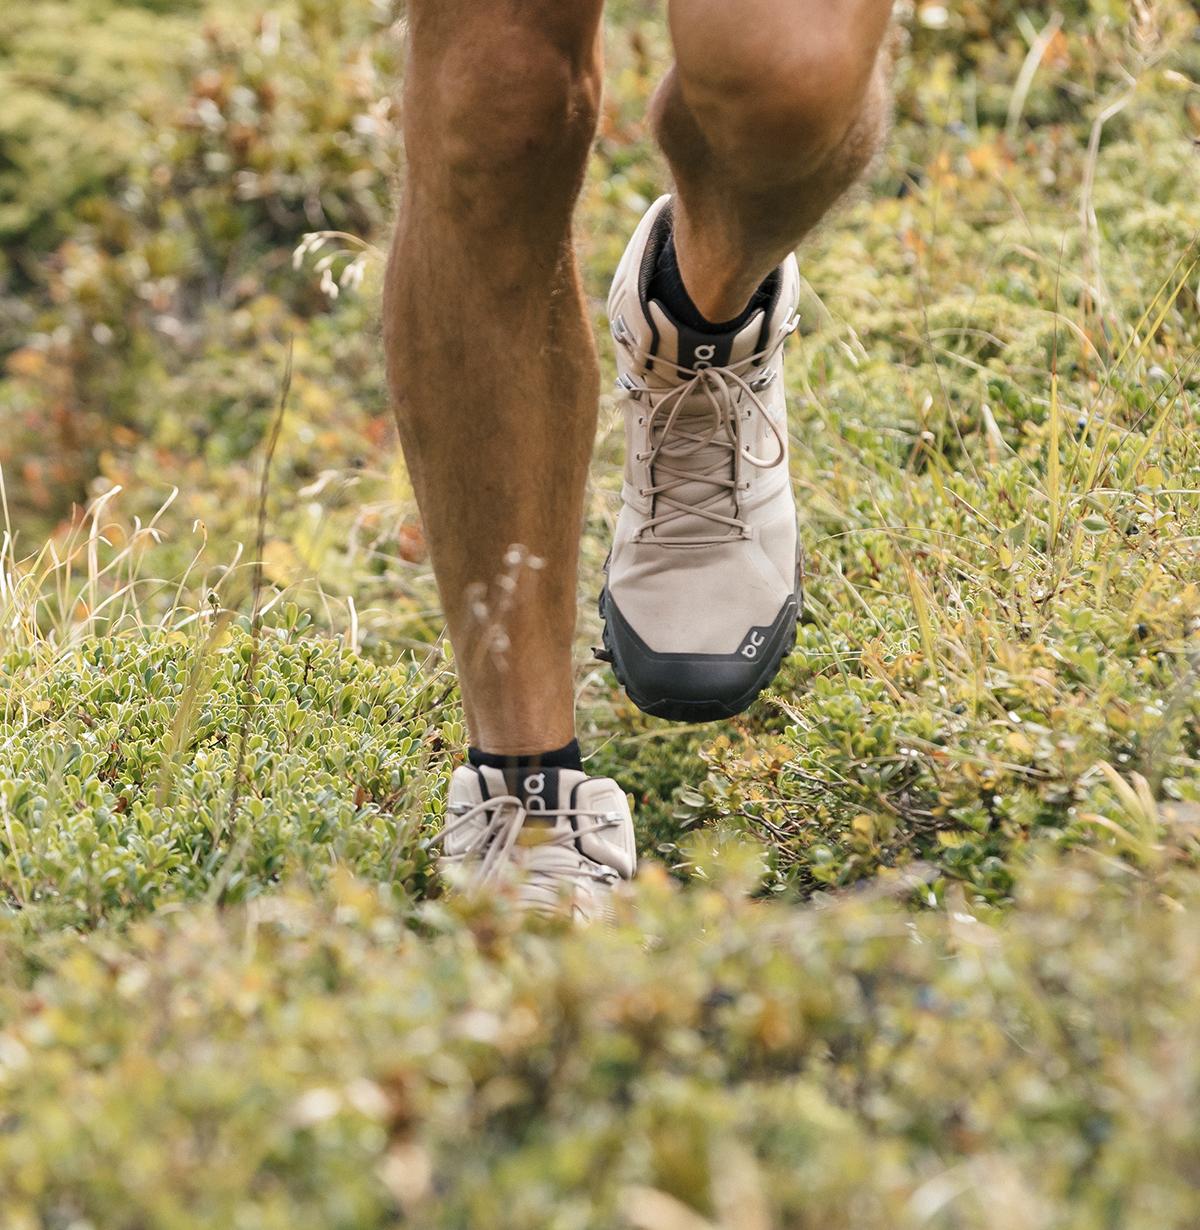 hiking boot: the Cloudrock Waterproof